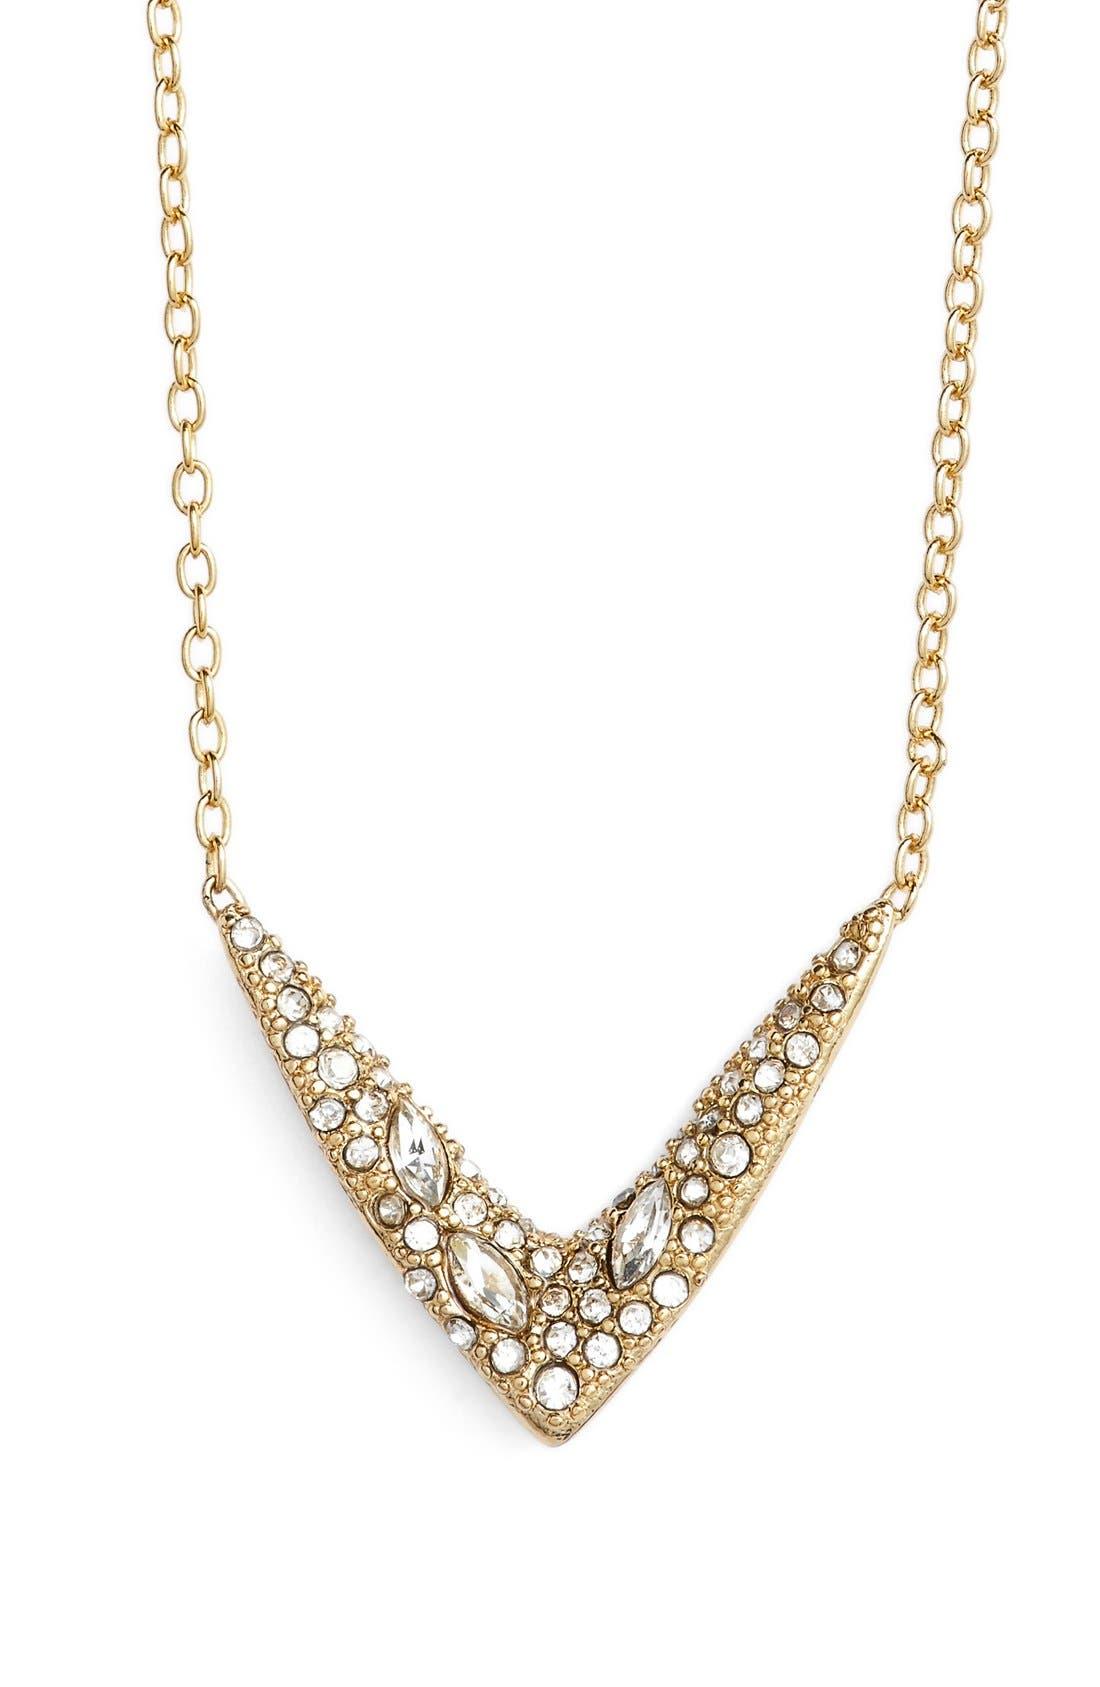 Main Image - Alexis Bittar 'Miss Havisham' Encrusted V Pendant Necklace